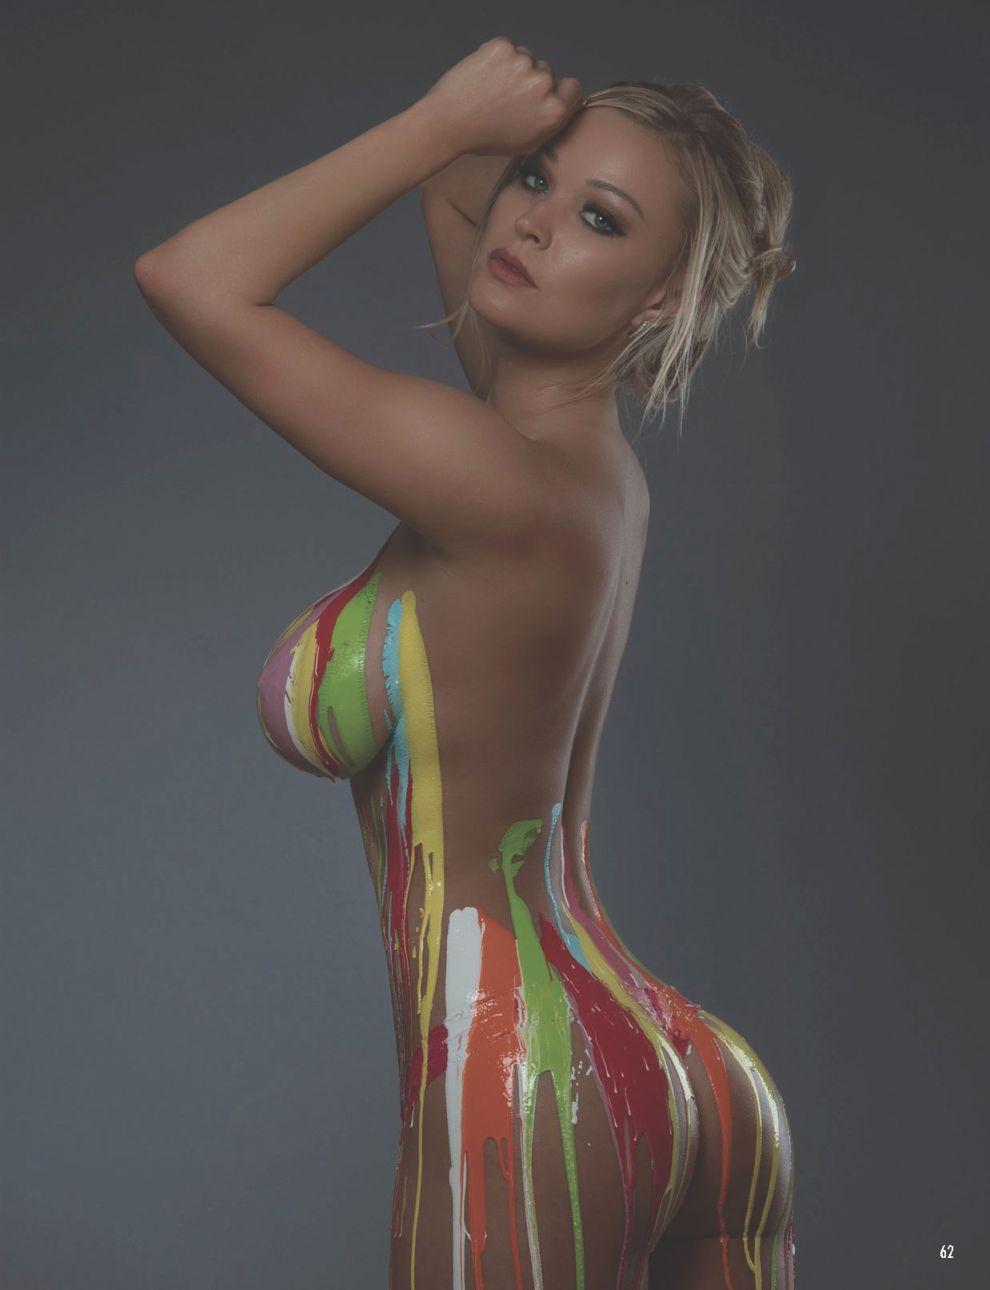 XXX Kimberley Jade nude (75 foto and video), Tits, Hot, Feet, braless 2018